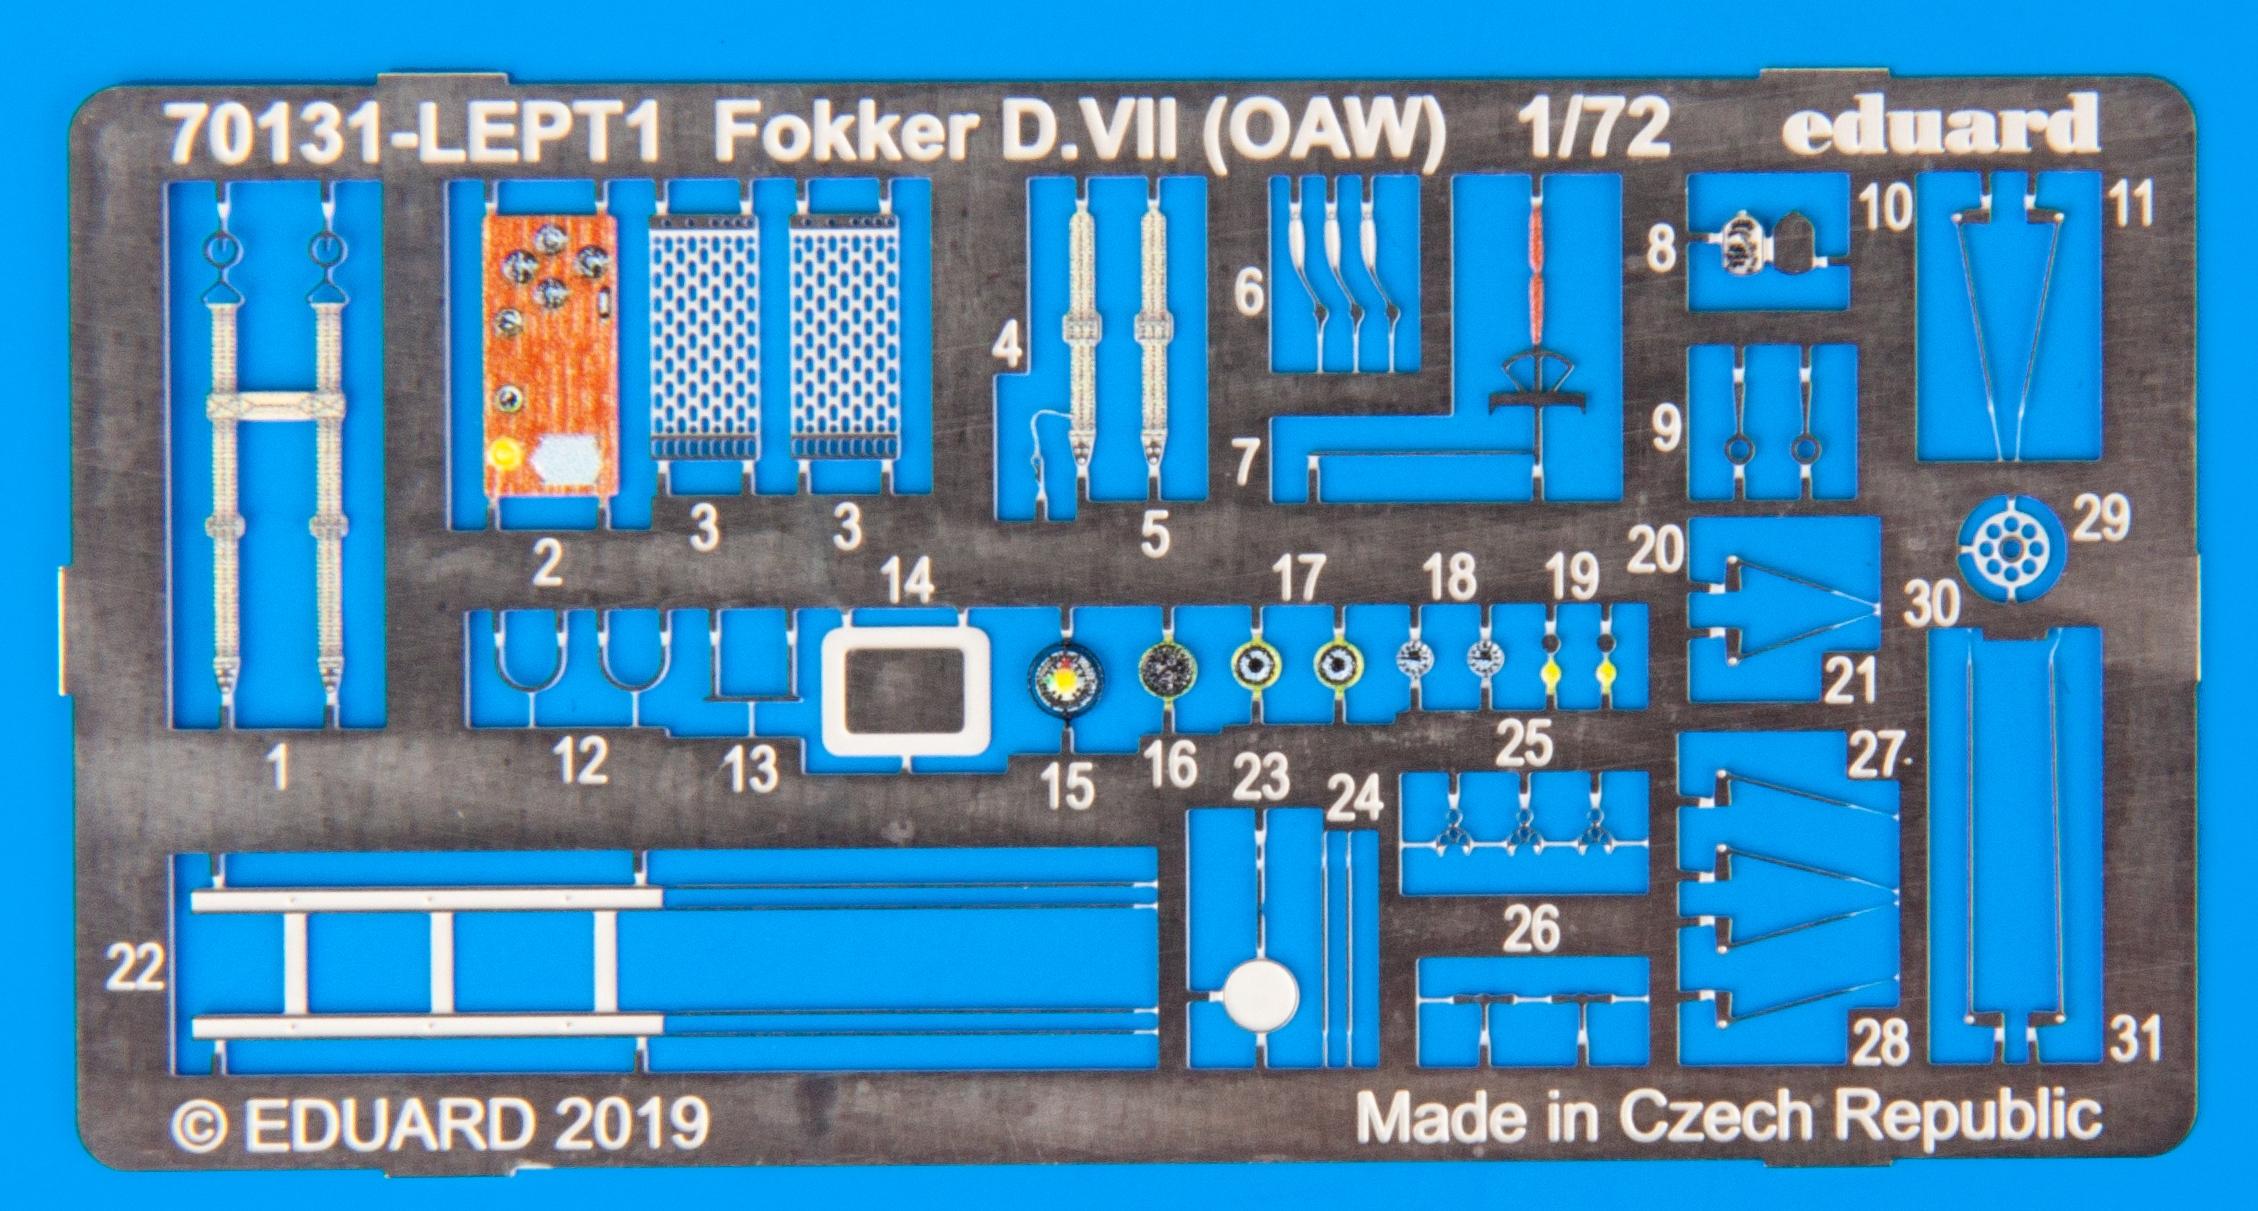 Eduard-70131-Fokker-D.VII-OAW-ProfiPack-Photoätzteile Fokker D. VII (OAW) in 1:72 von Eduard # 70131